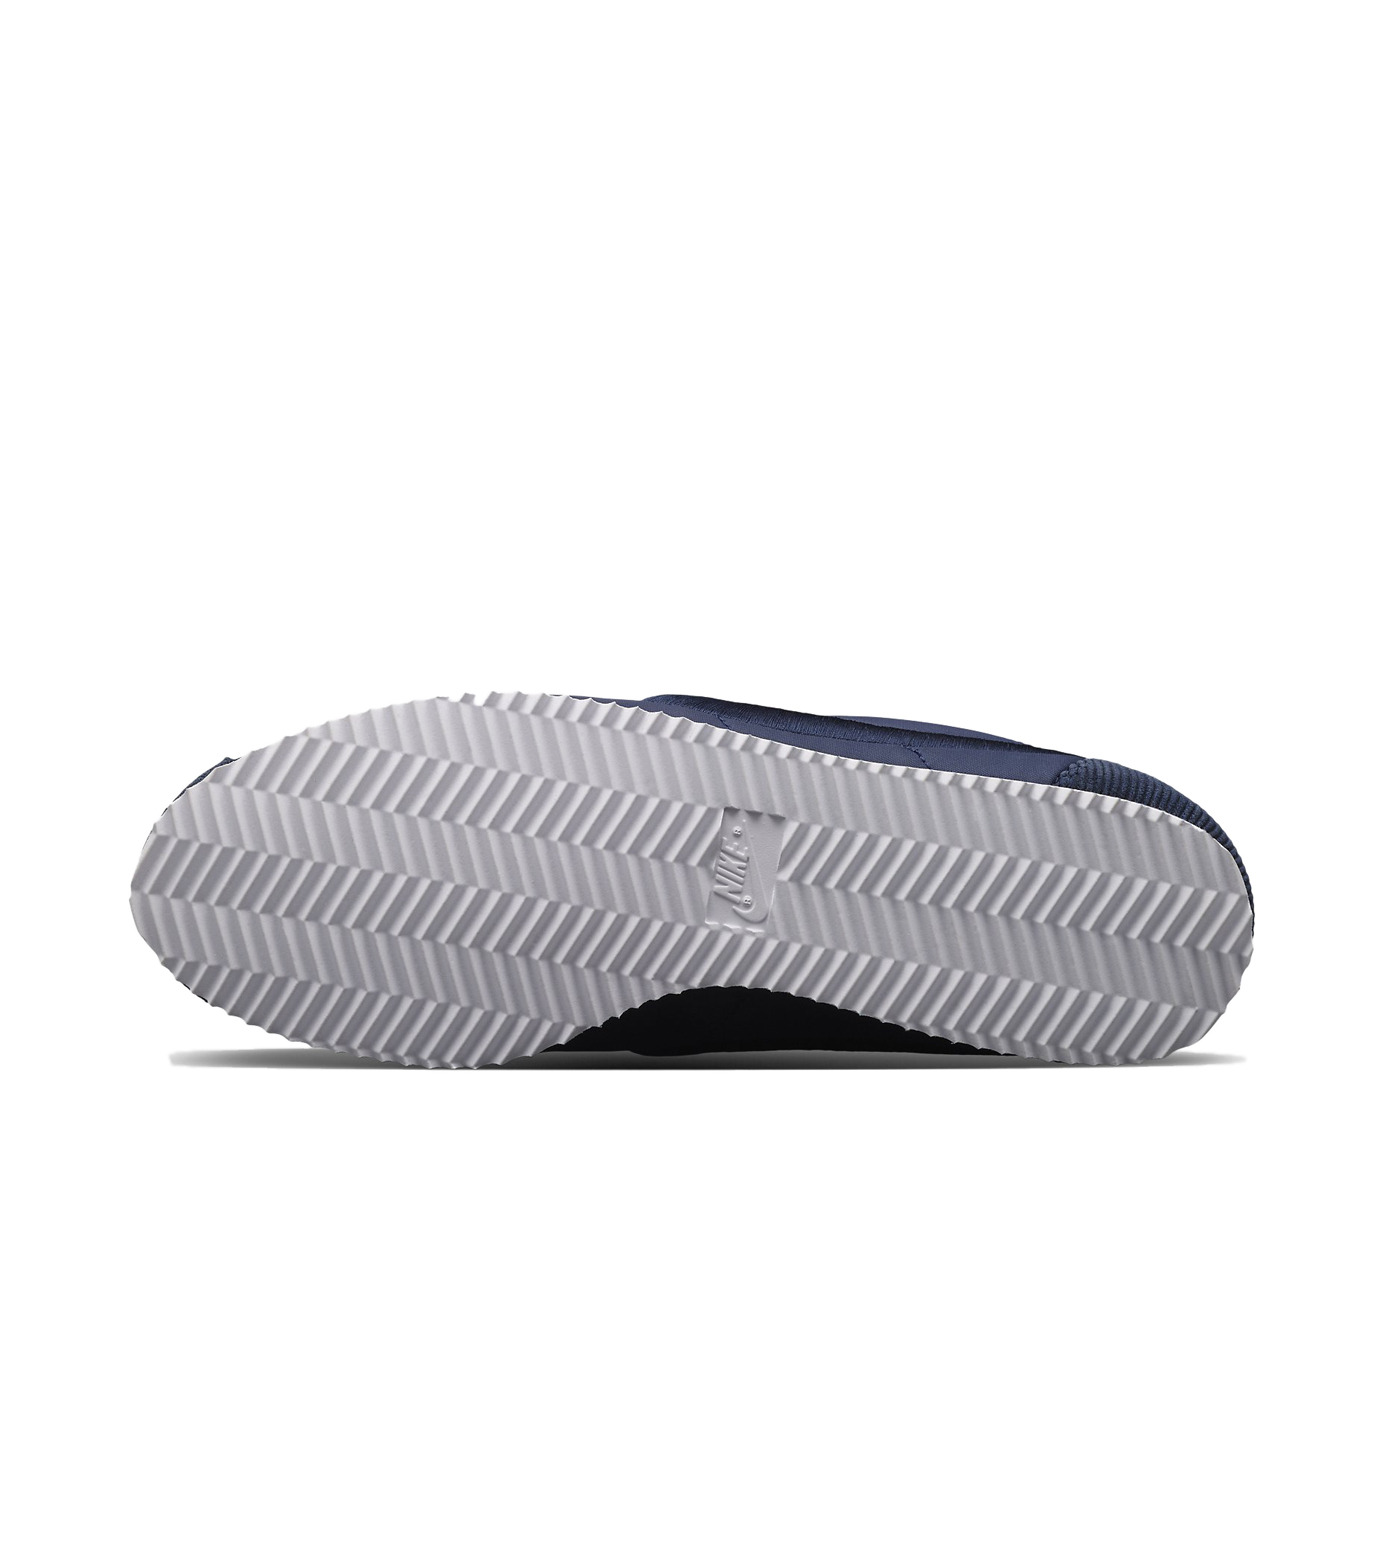 NIKE(ナイキ)のCLASSIC CORTEZ SP-NAVY(シューズ/shoes)-789594-441-93 拡大詳細画像2